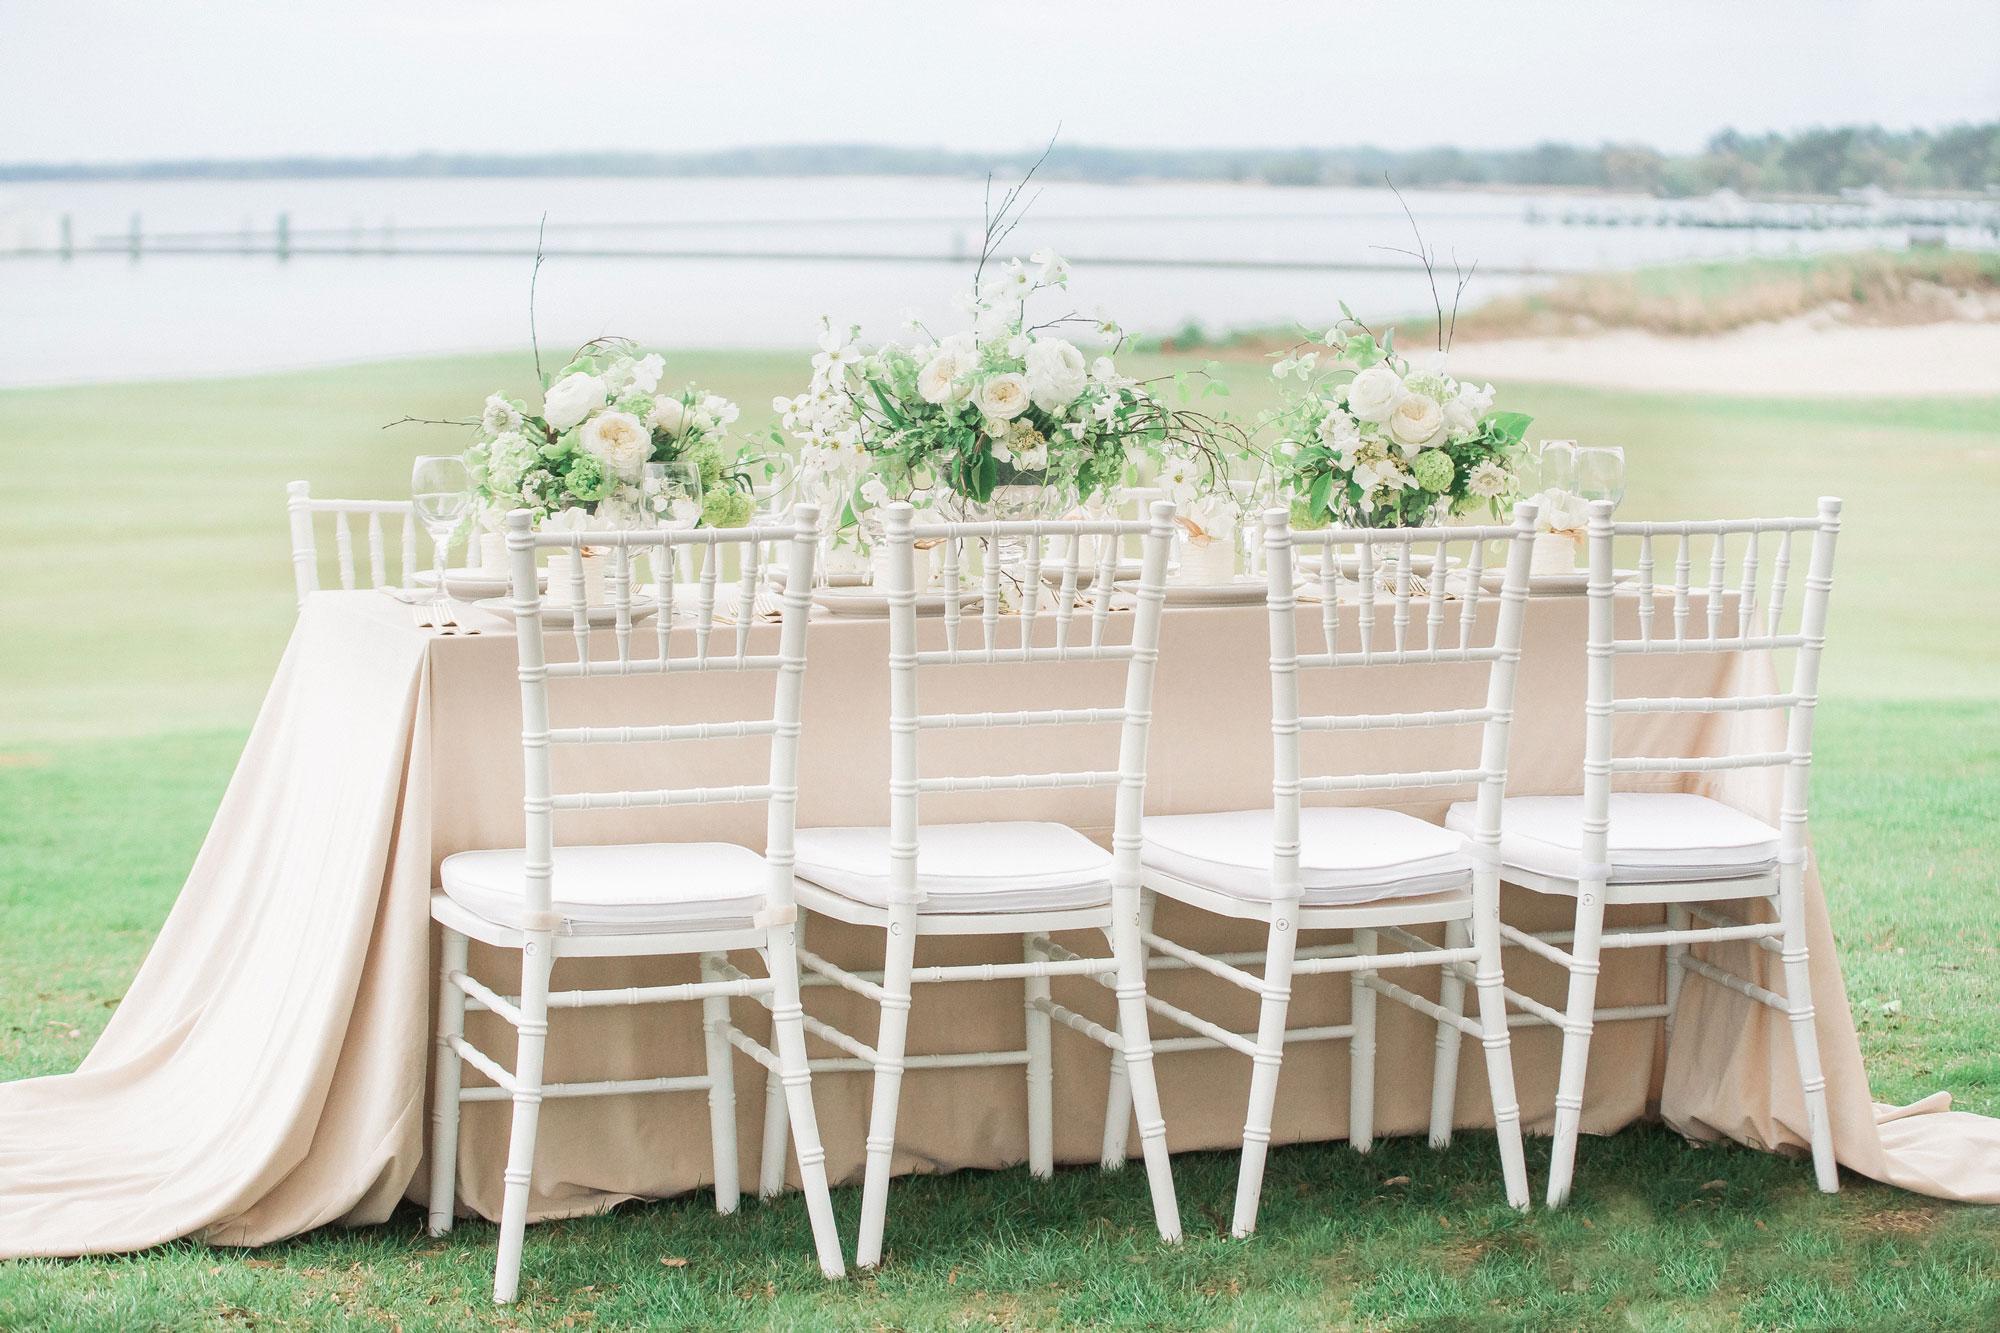 Chesapeake-Bay-Eastern-Shore-Hyatt-Chesapeake-Bay-Maryland-Wedding-Photographer-Photo-67_blog